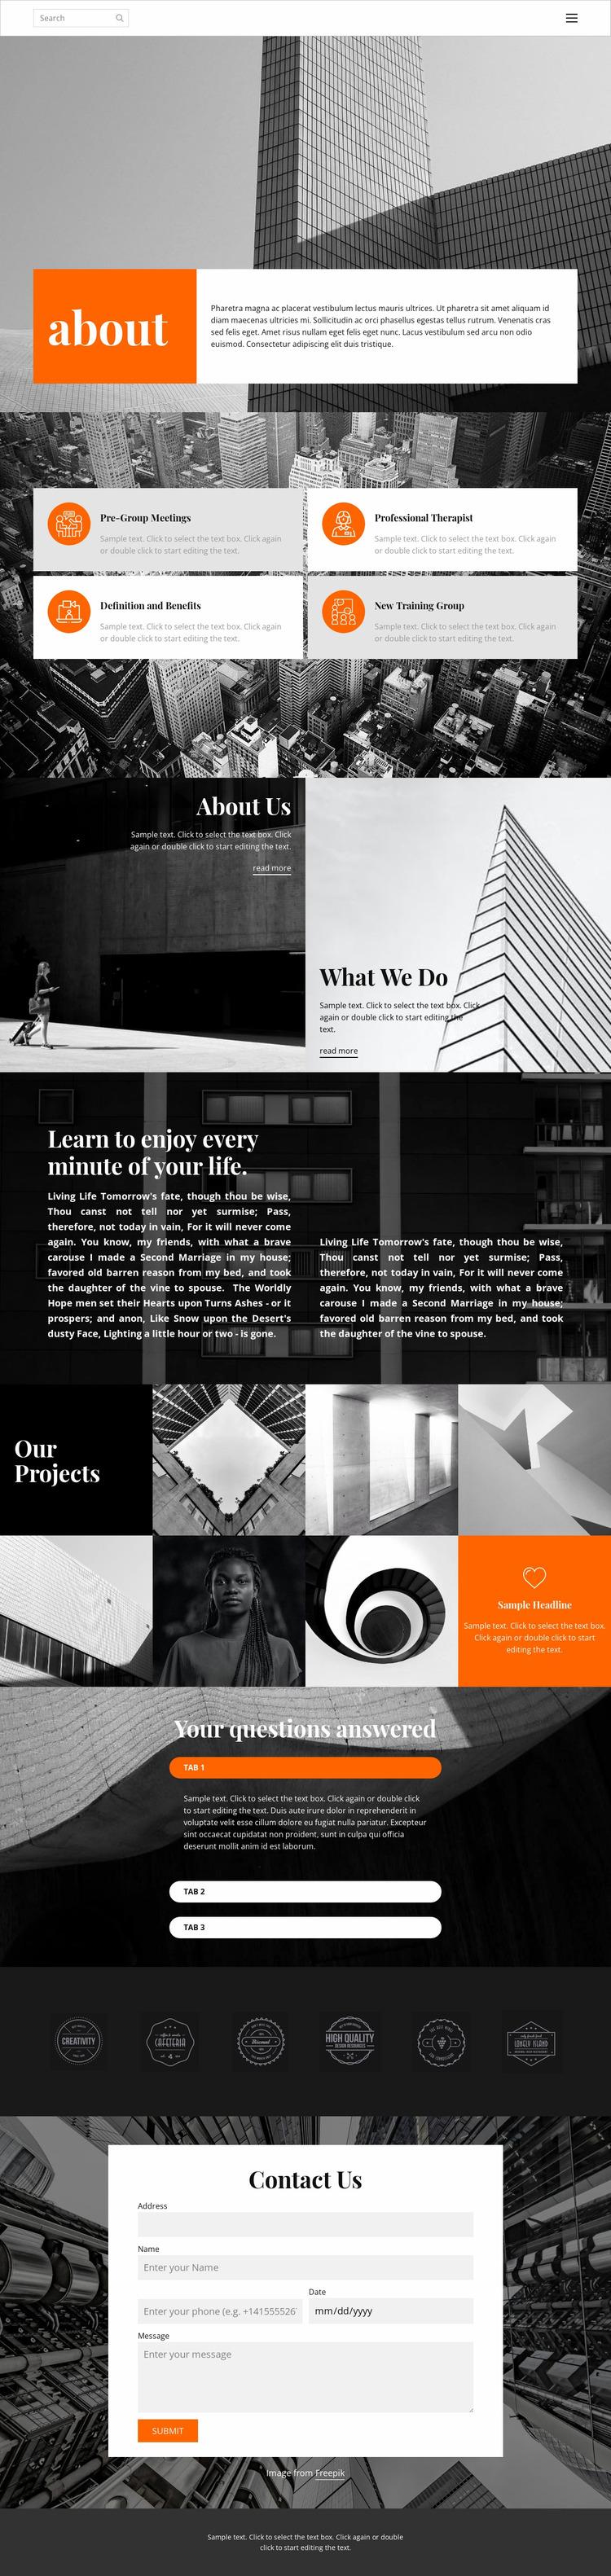 New projects studio Website Mockup